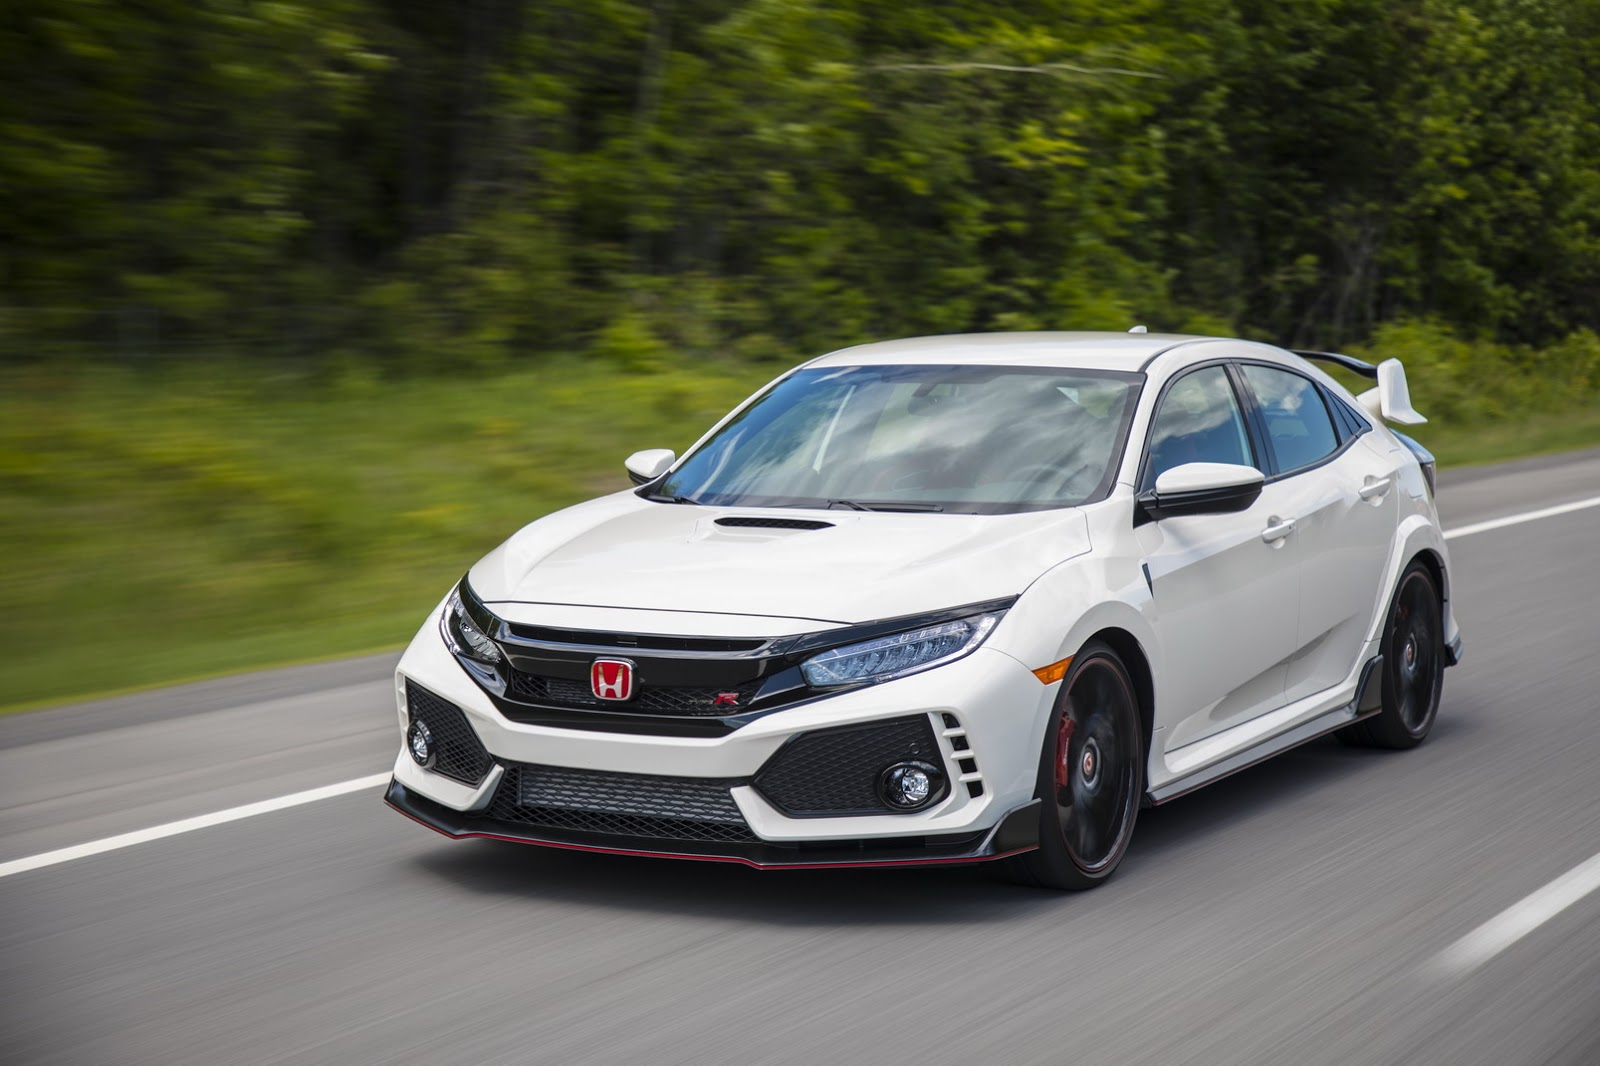 2017_Honda_Civic_Type_R_185